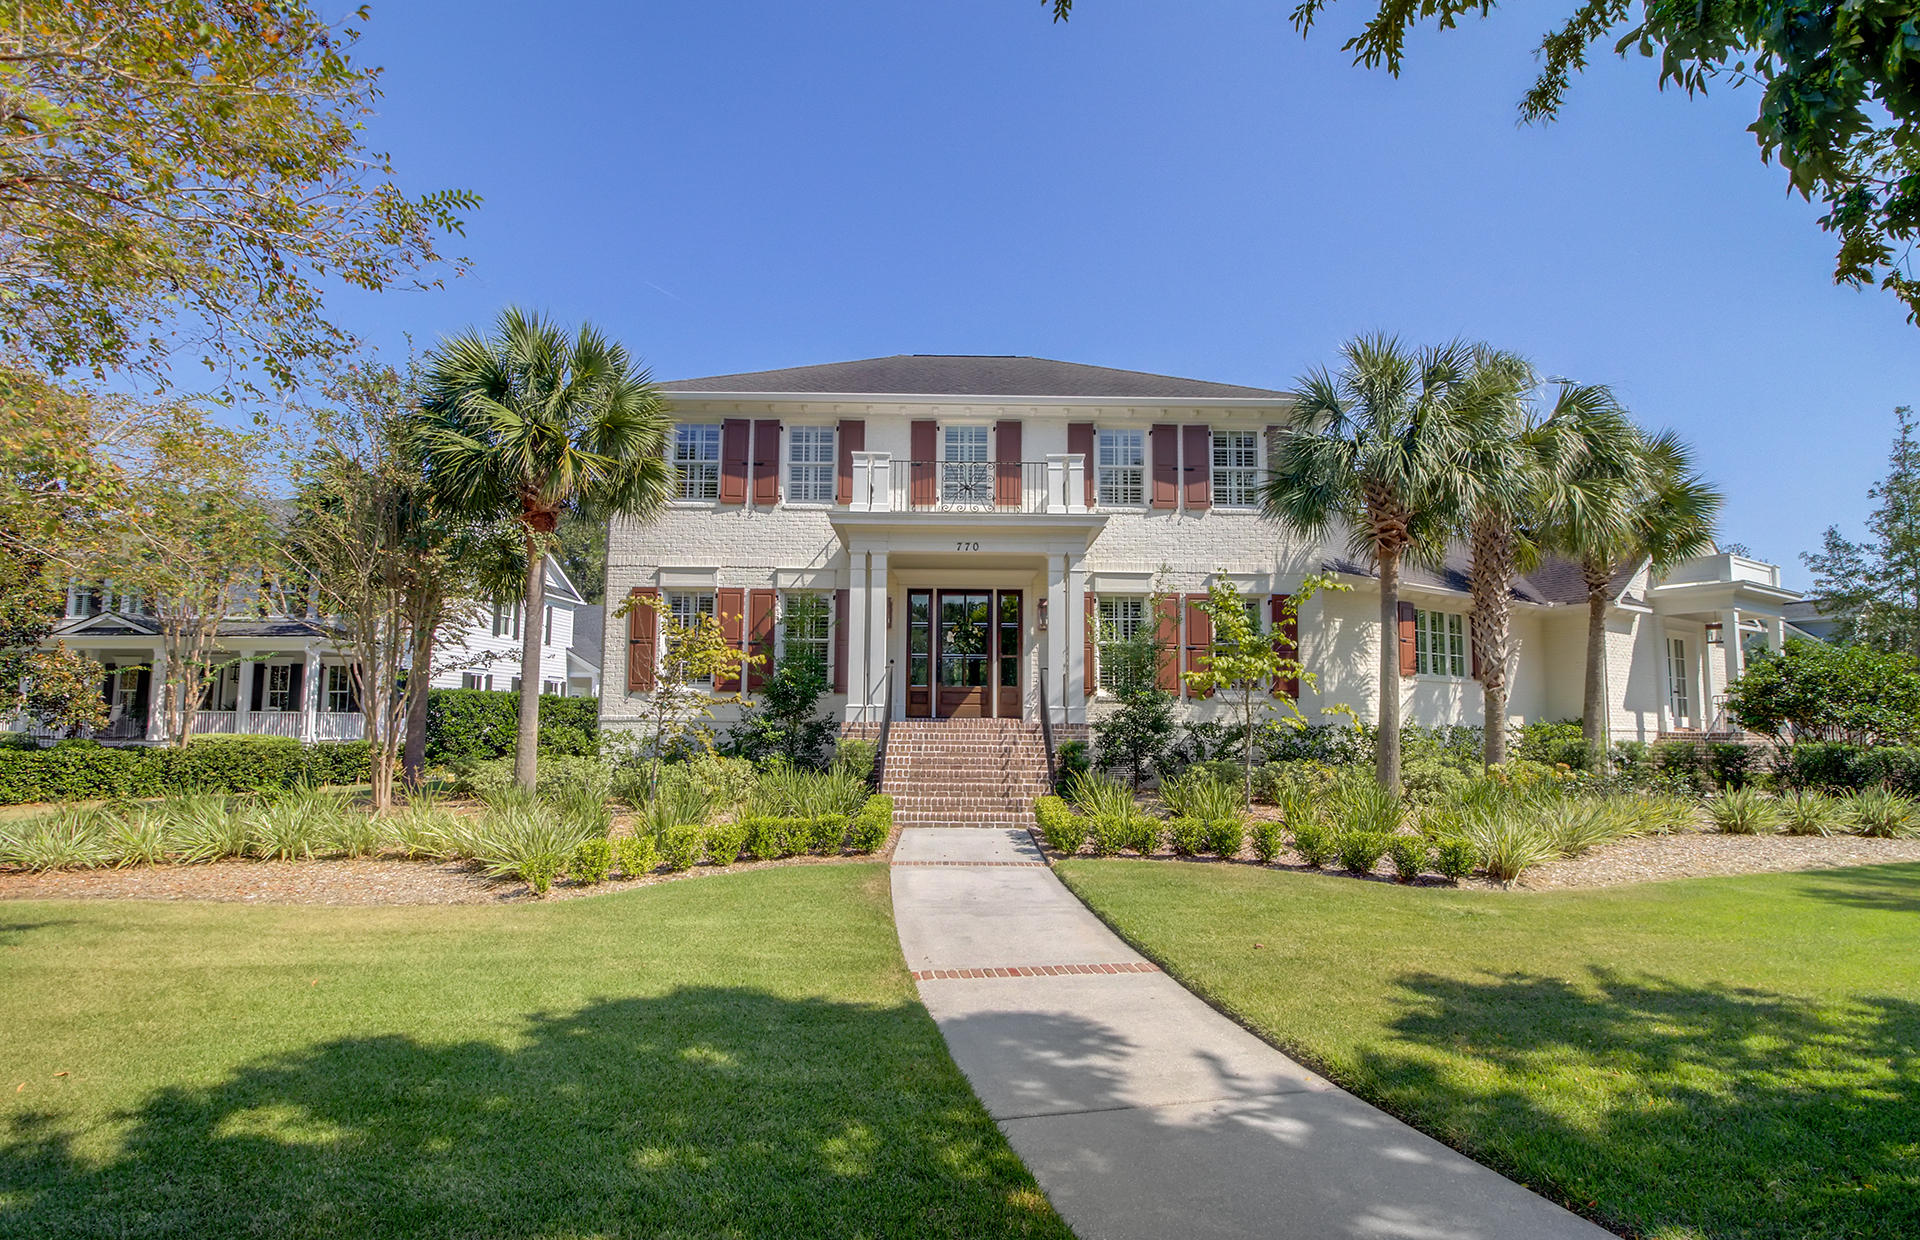 Olde Park Homes For Sale - 770 Olde Central, Mount Pleasant, SC - 82